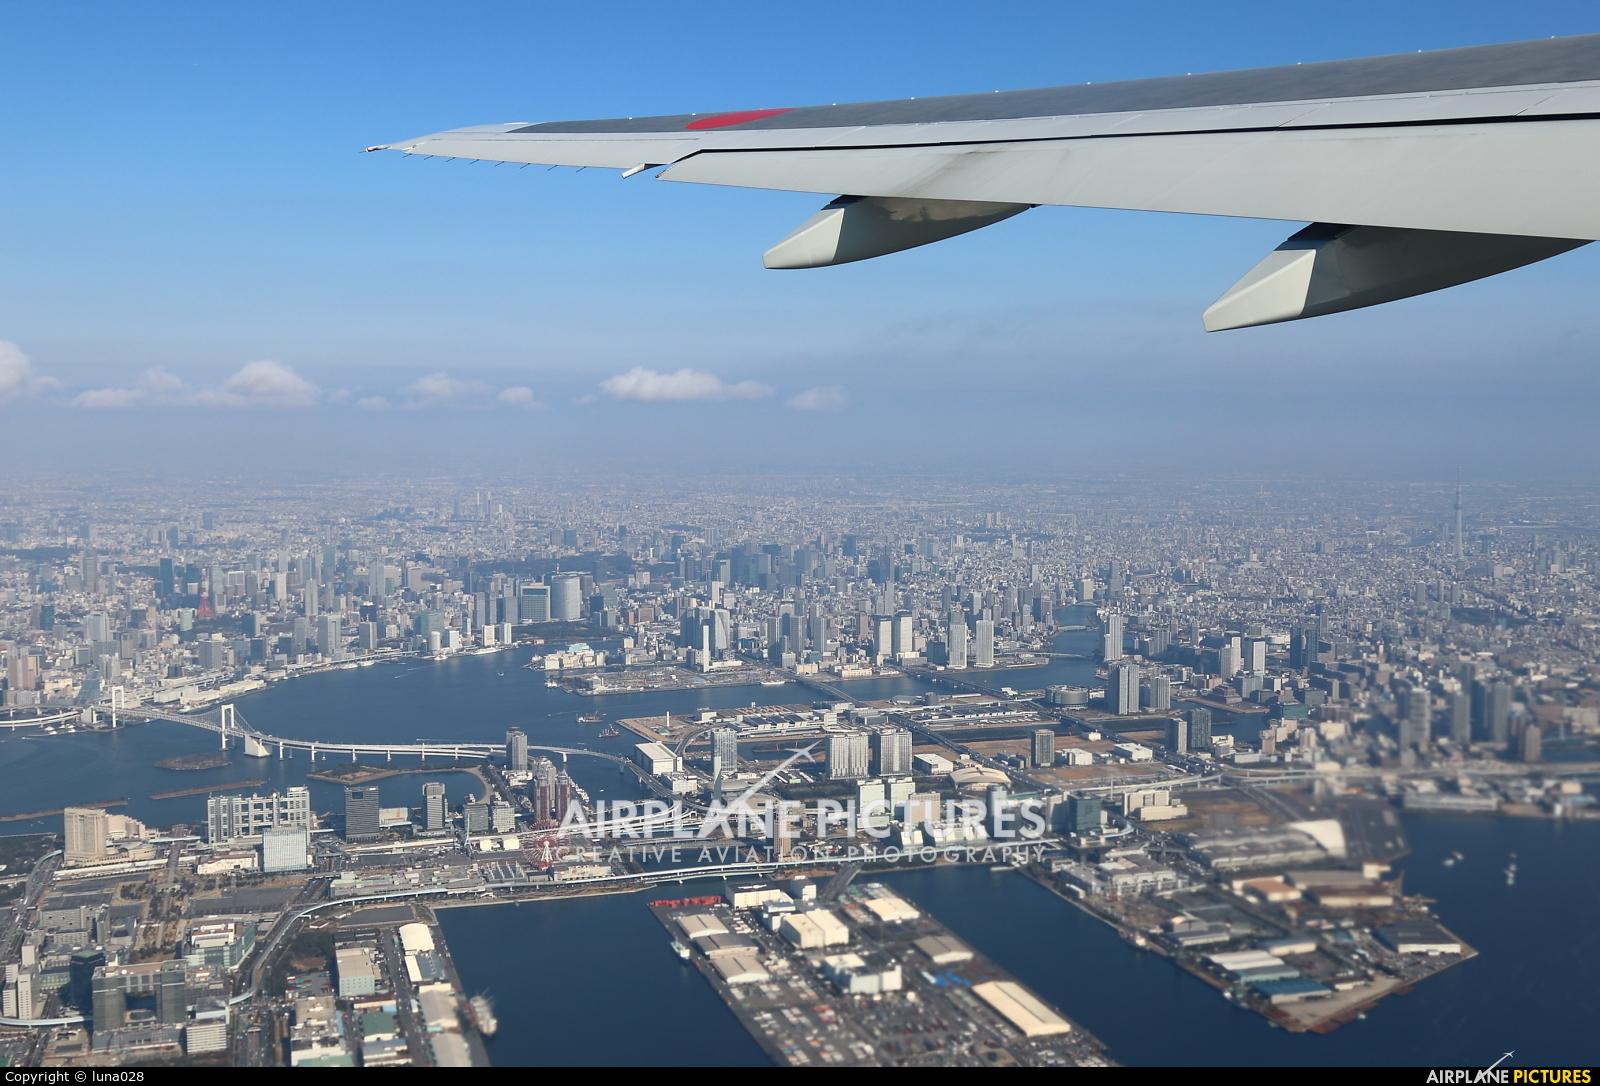 ANA - All Nippon Airways JA714A aircraft at In Flight - Japan